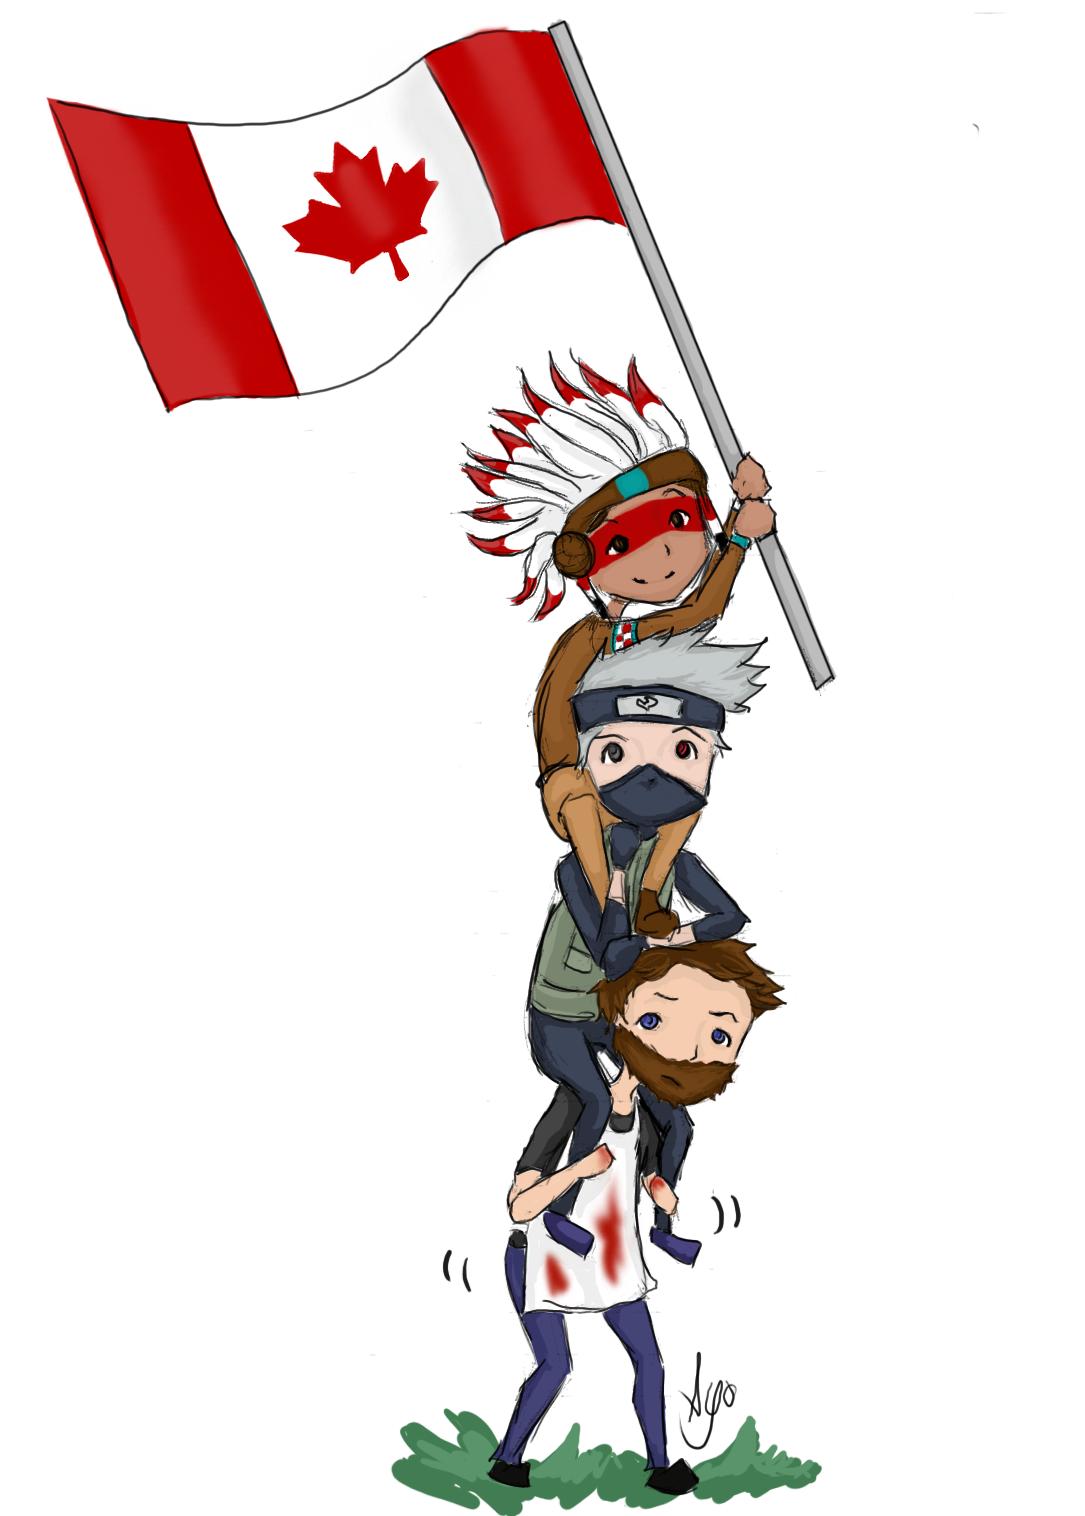 Drawn totem pole canadian Canada mindcrack pole! Team totem